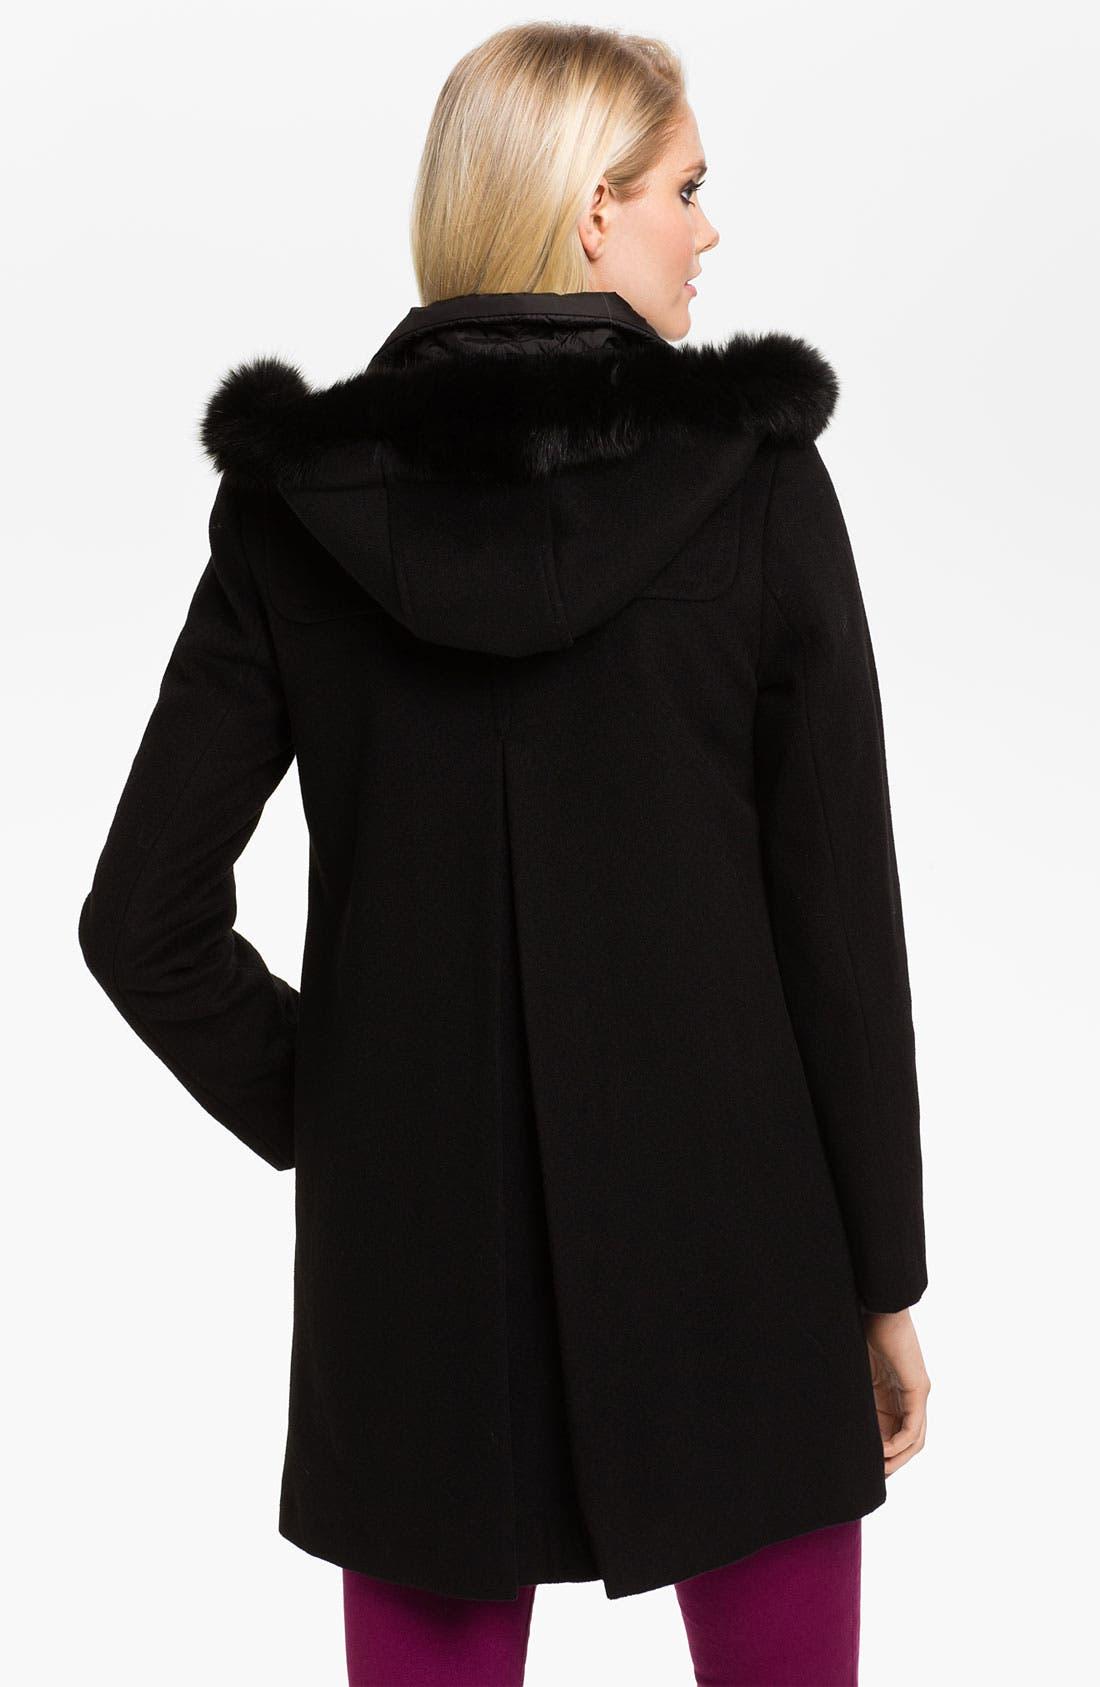 Alternate Image 2  - Ellen Tracy Turnkey Coat with Fur Trim Hood (Online Exclusive)